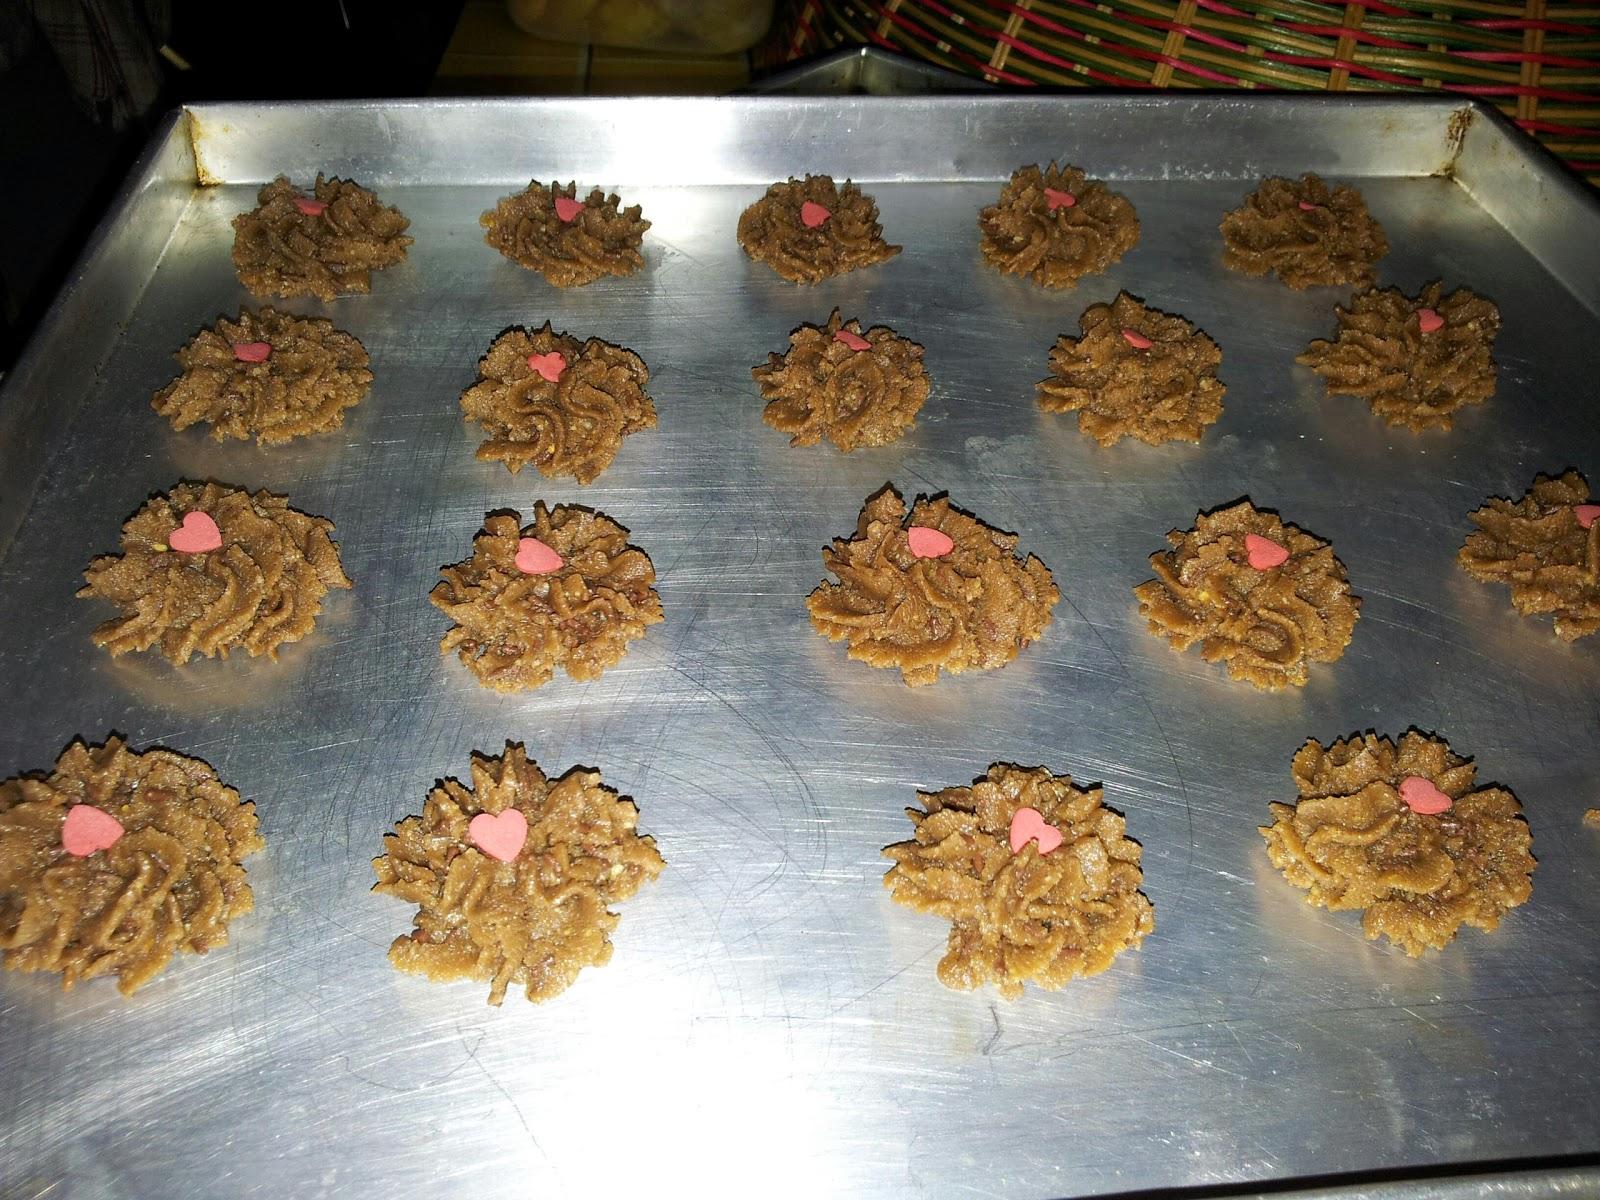 ZULFAZA LOVES COOKING: Biskut coklat urai/chocolate rice cookies